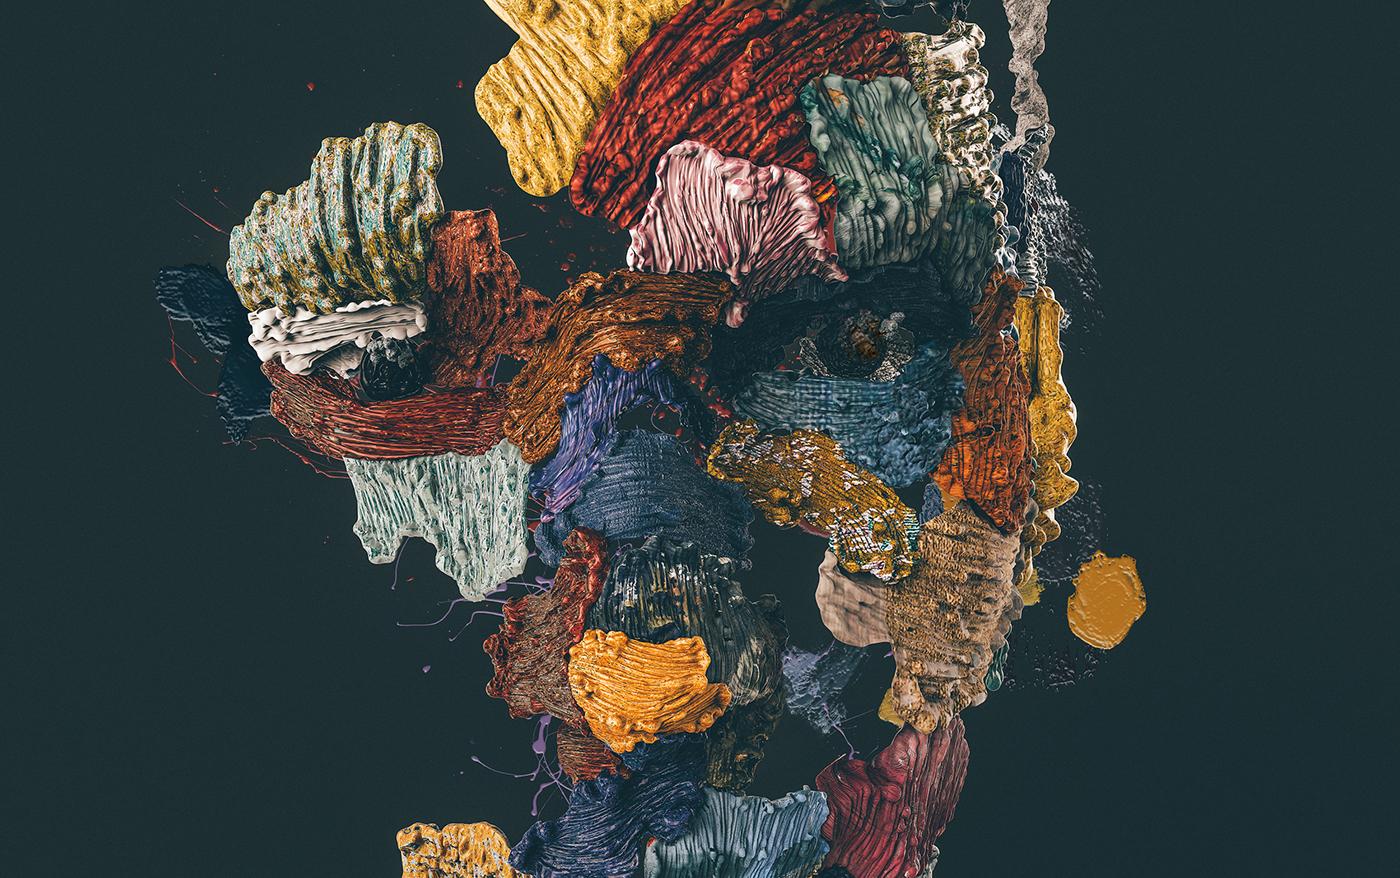 nastplas oil colors stroke 3D art creative paint artwork masterpiece